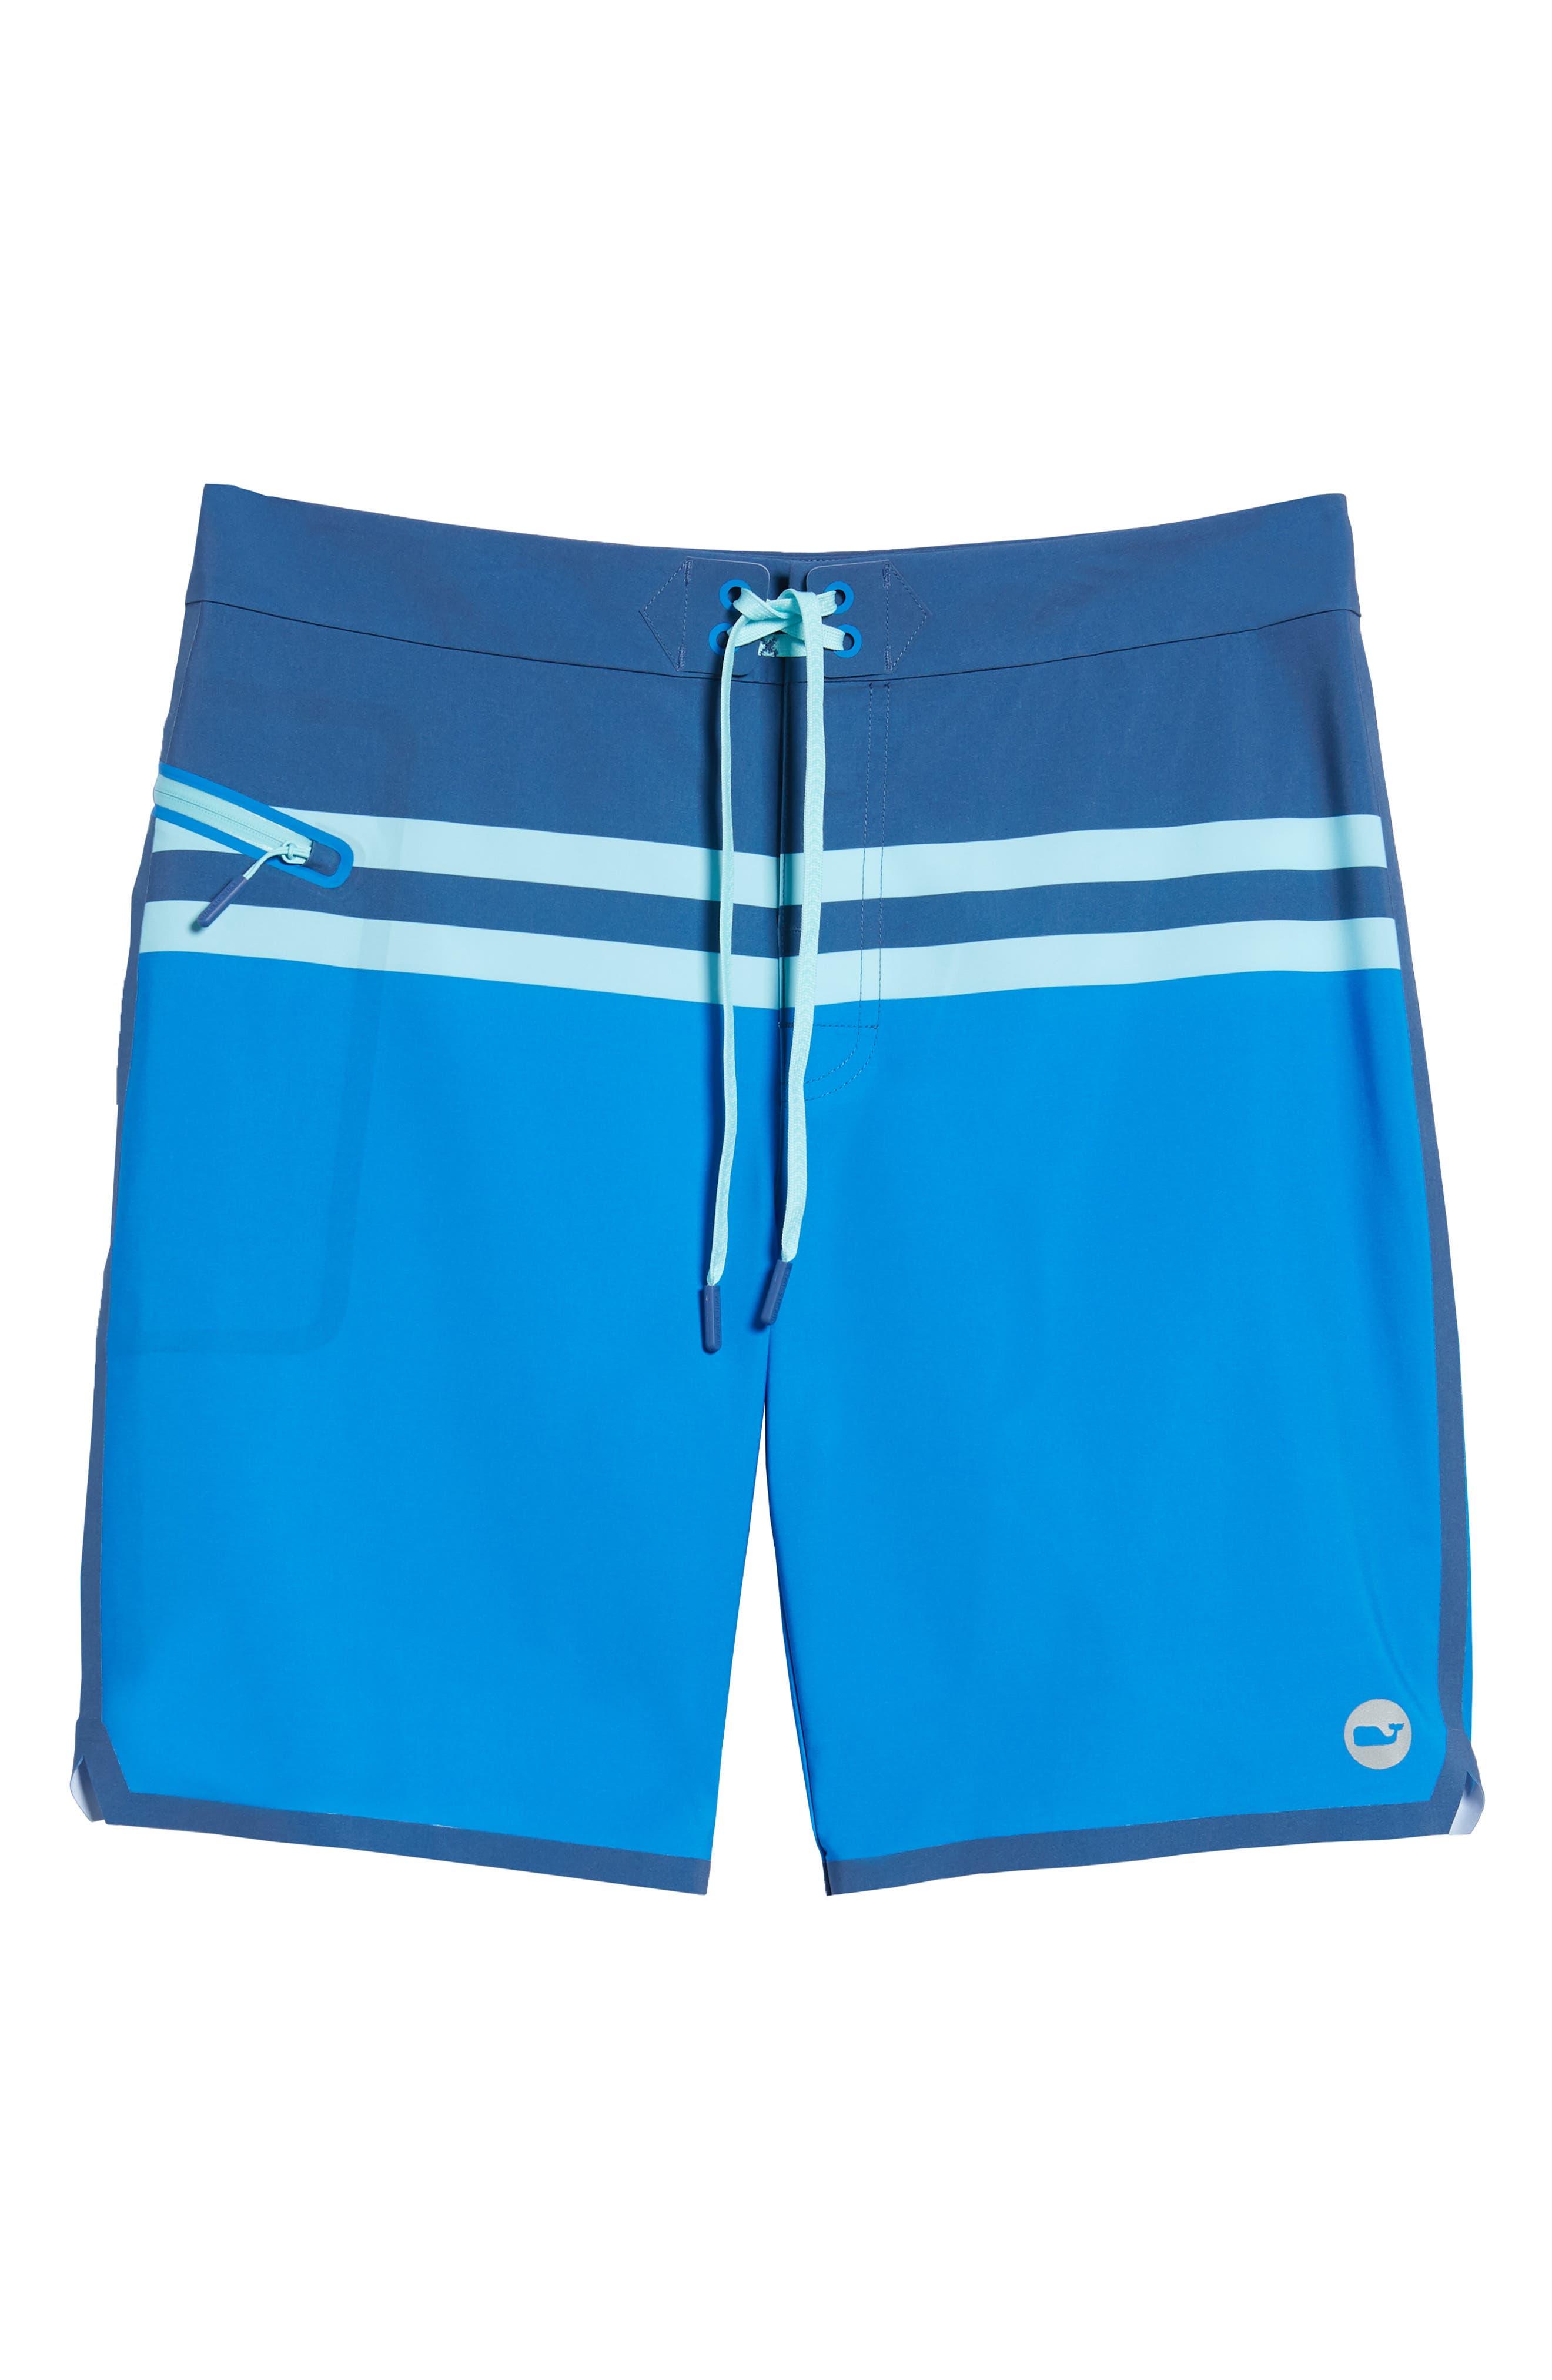 Bay Ridge Board Shorts,                             Alternate thumbnail 6, color,                             Azure